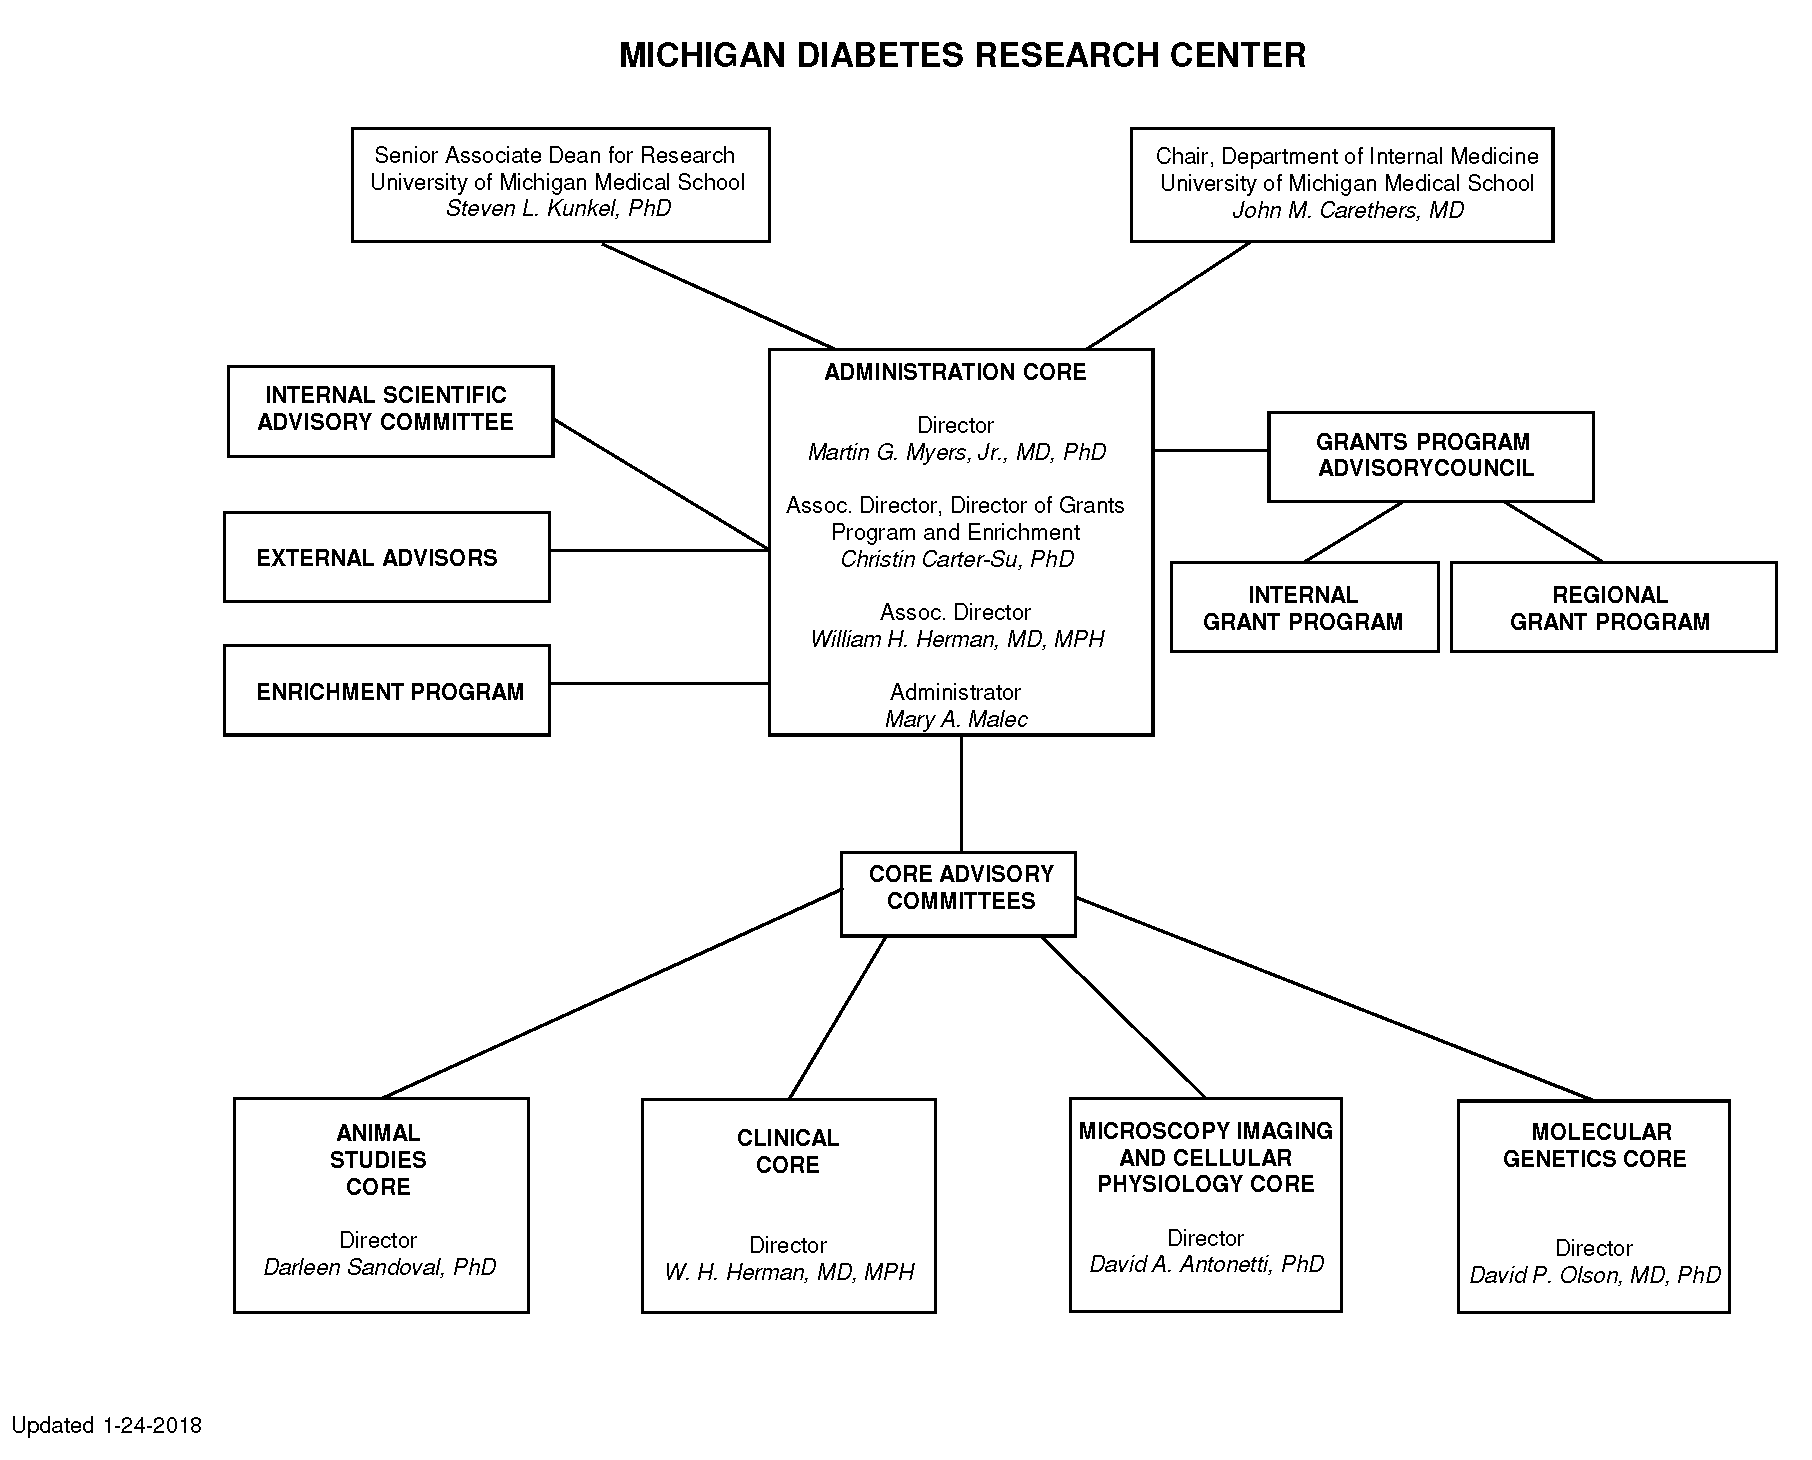 MDRC Org Chart